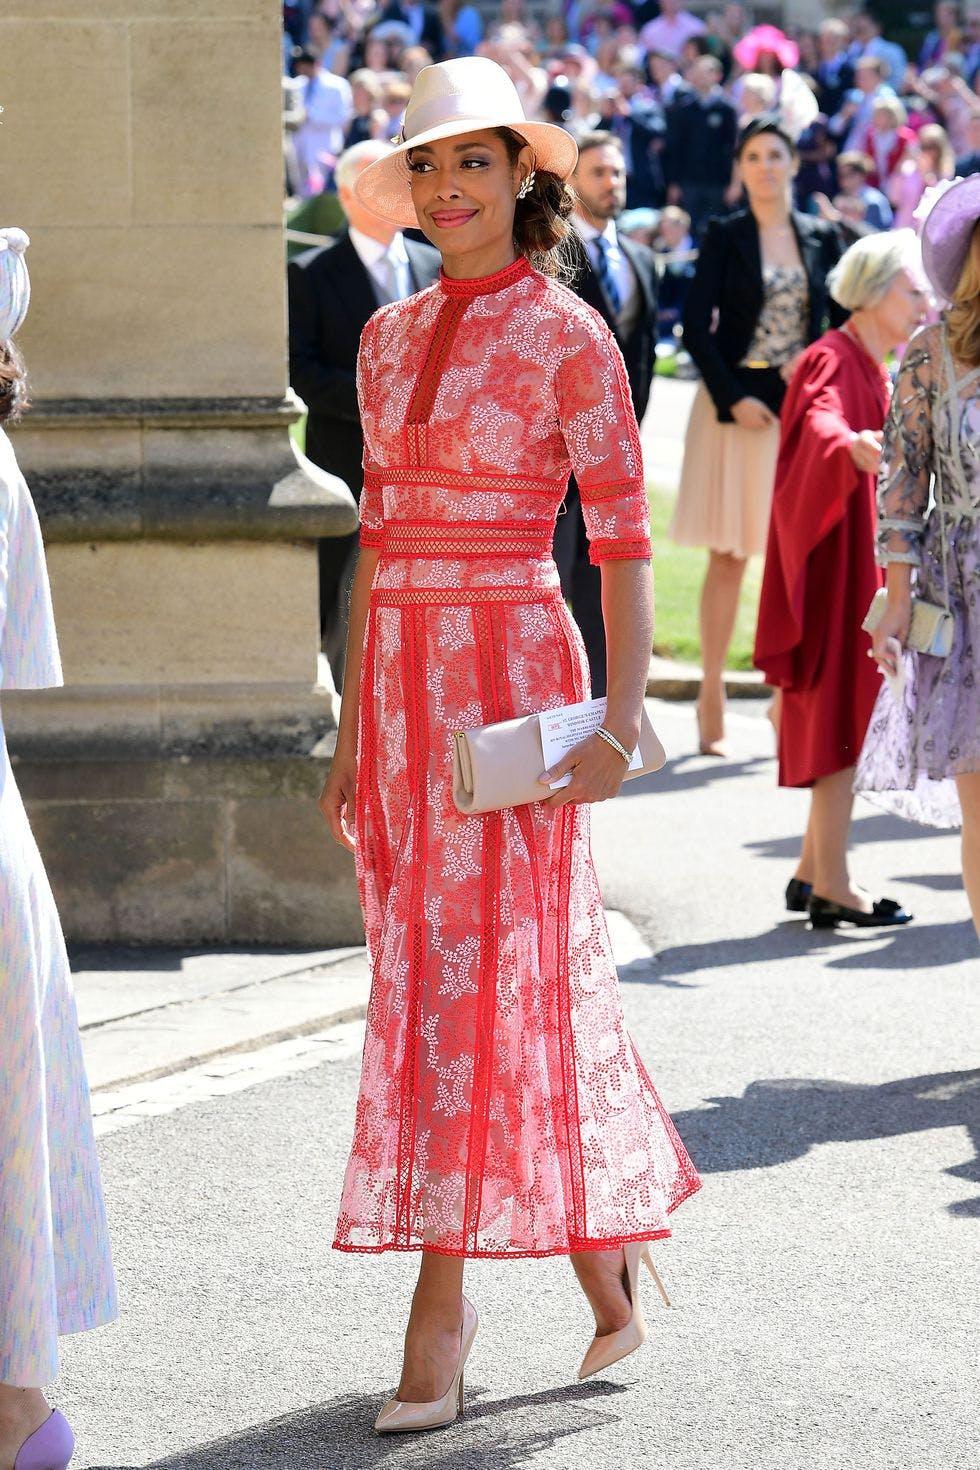 gina torrest best dressed at the royal wedding